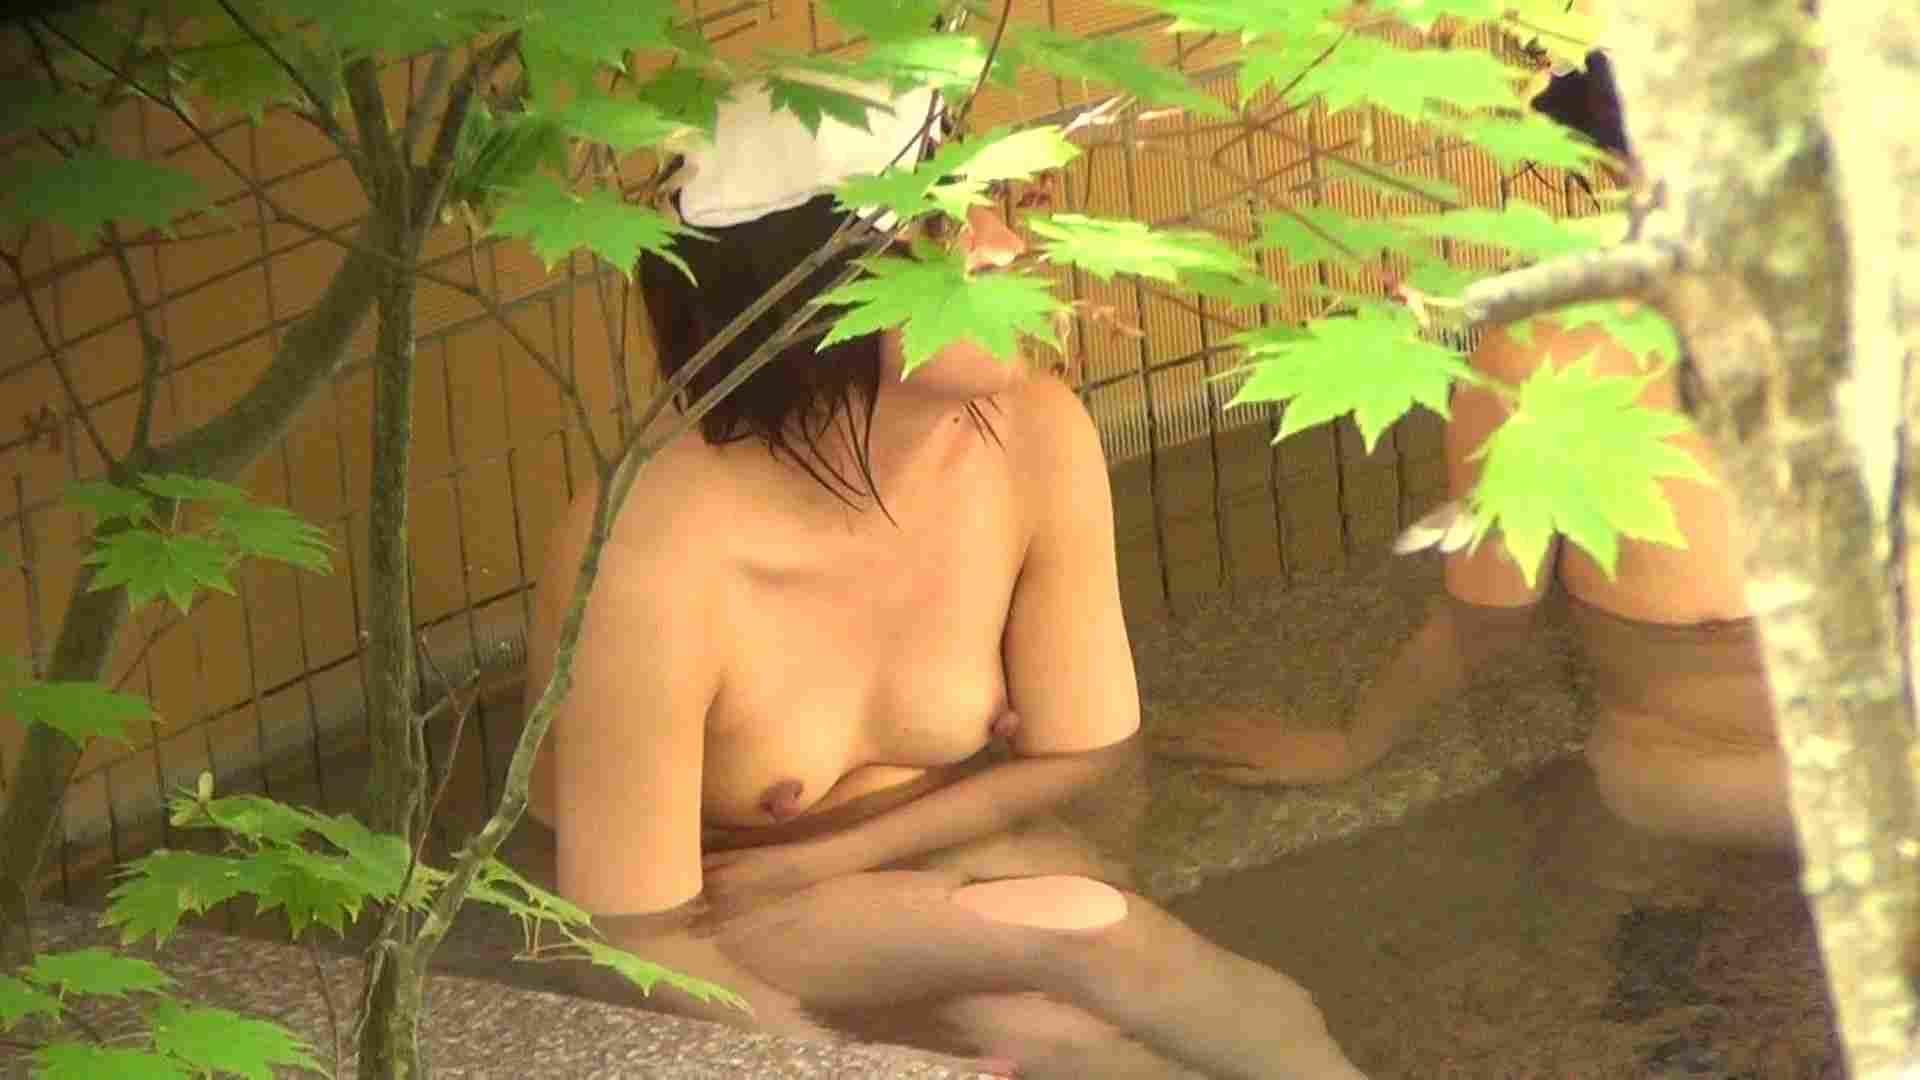 Aquaな露天風呂Vol.248 露天風呂編  97PIX 46